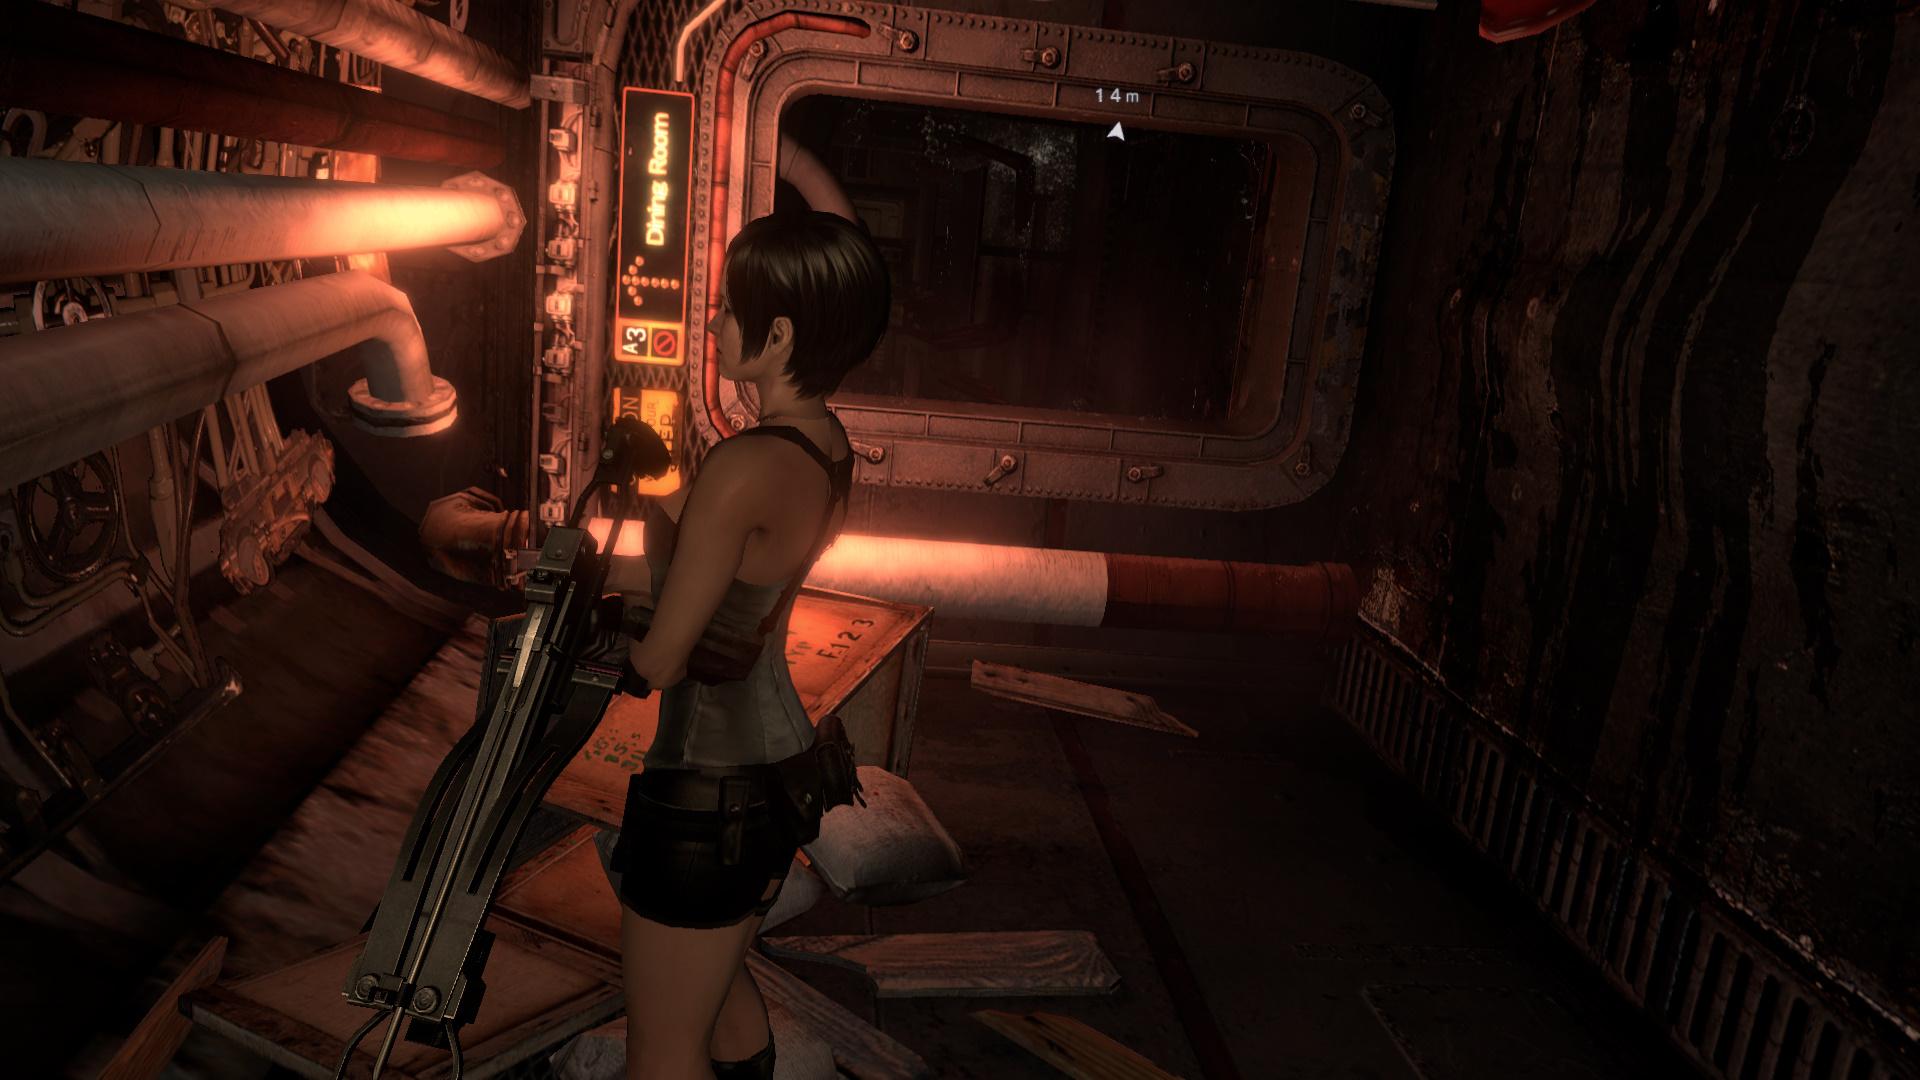 Jill Resident Evil 3 0_10a937_e6d64838_orig